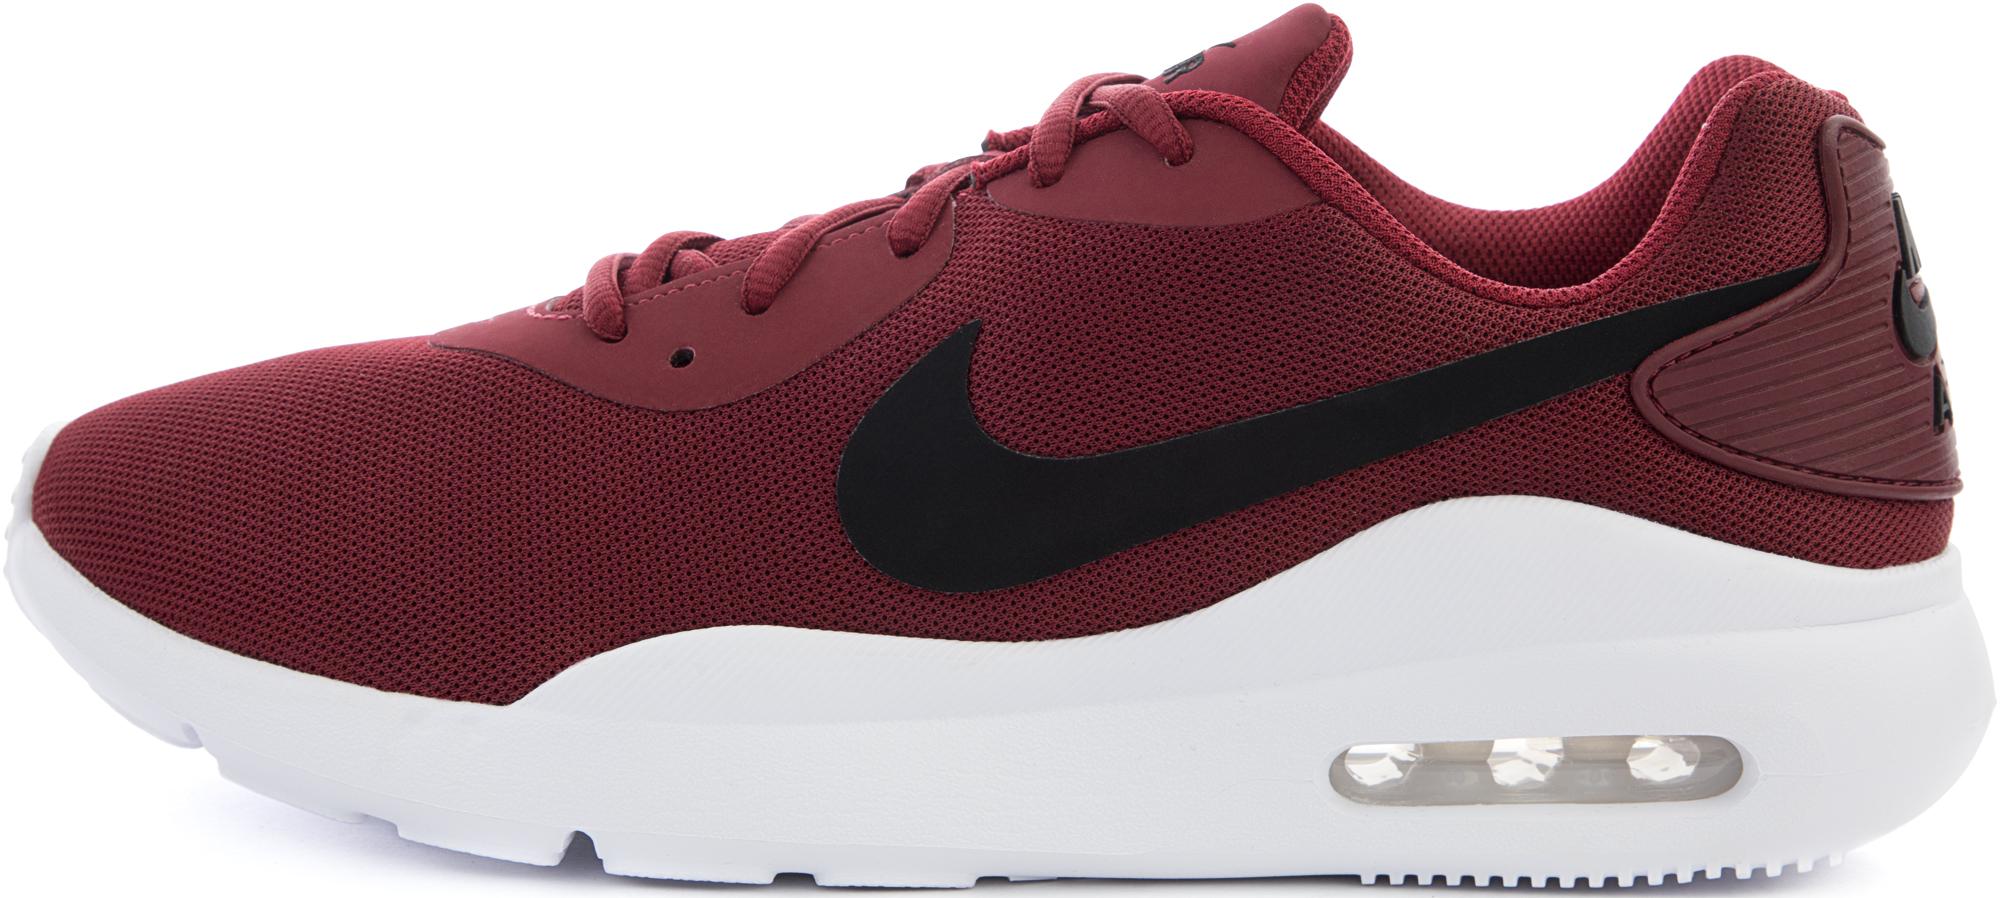 Nike Кроссовки мужские Nike Air Max Raito, размер 46,5 цена 2017